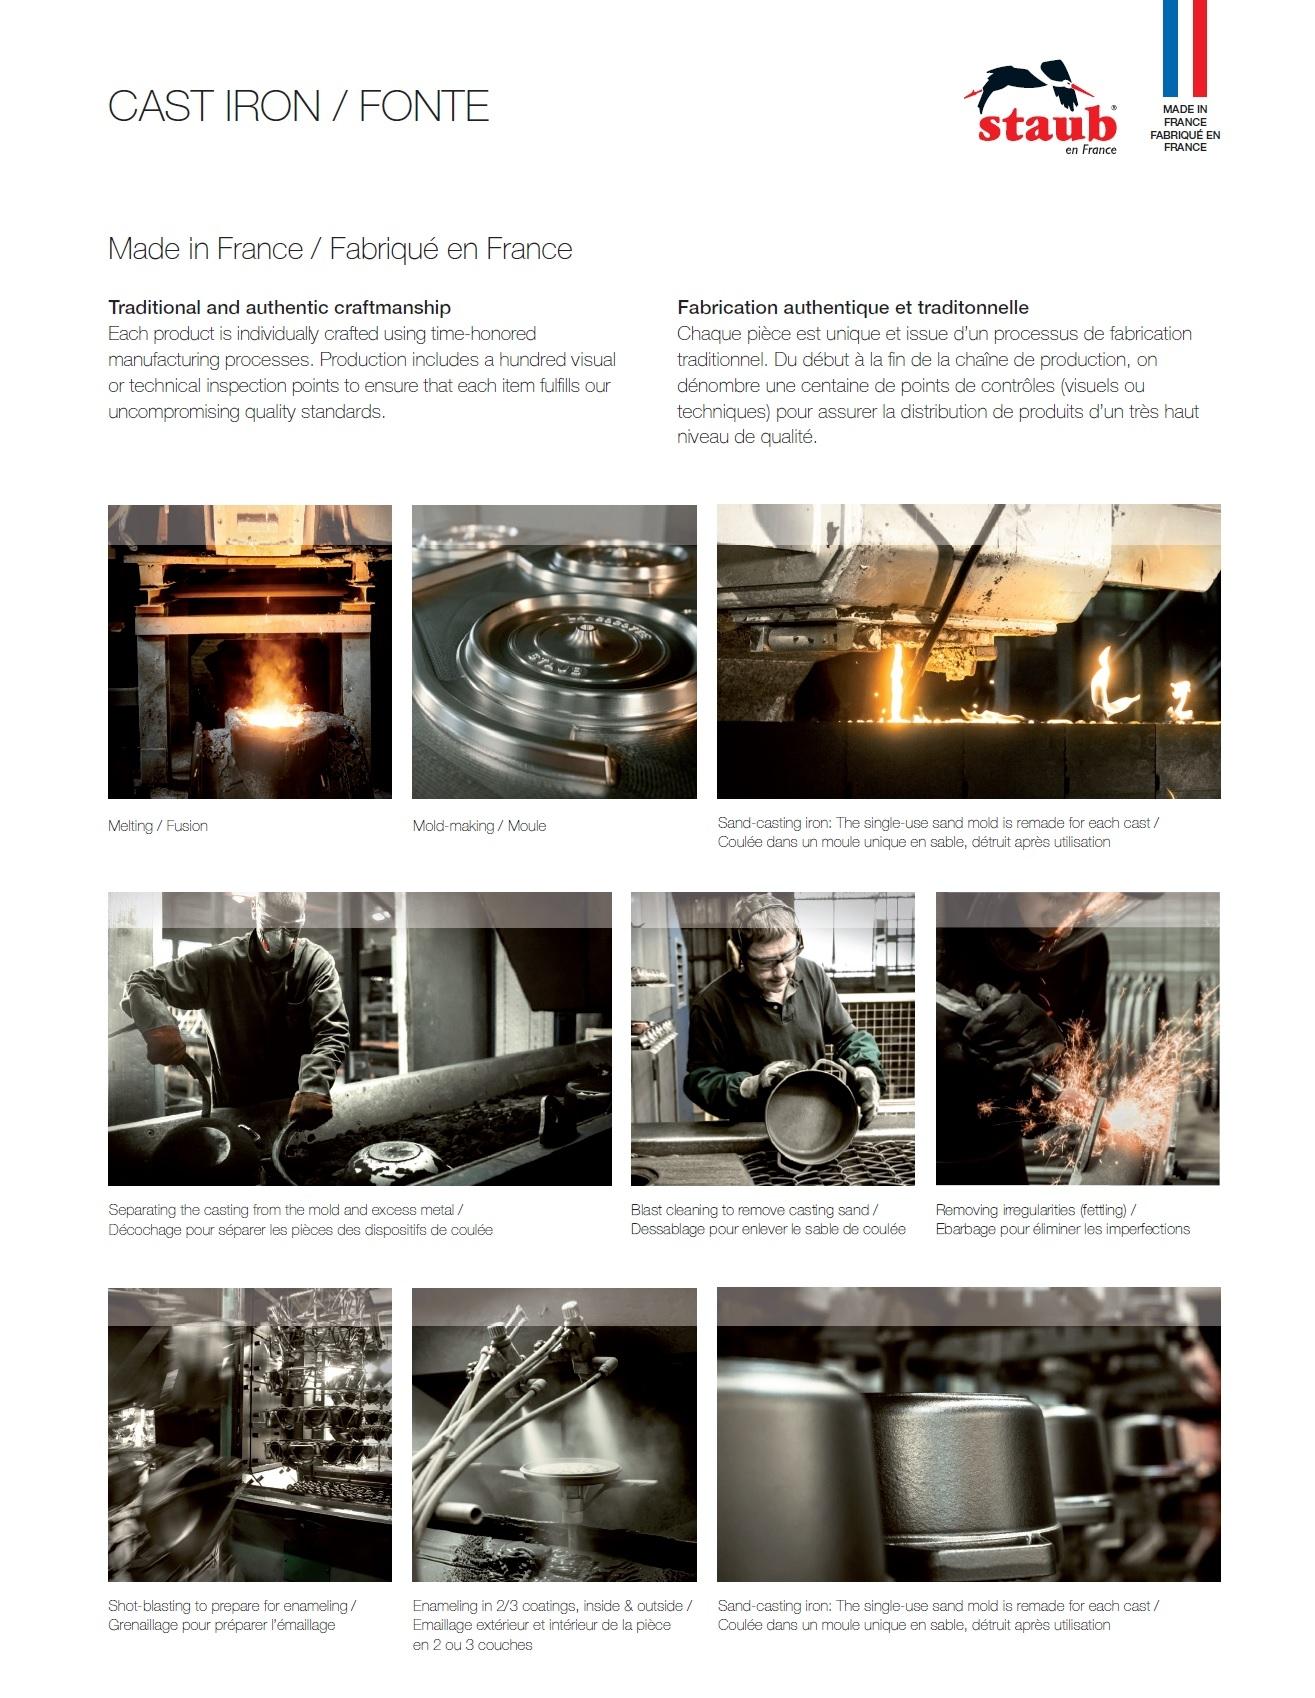 Staub Cast Iron - How It's Made